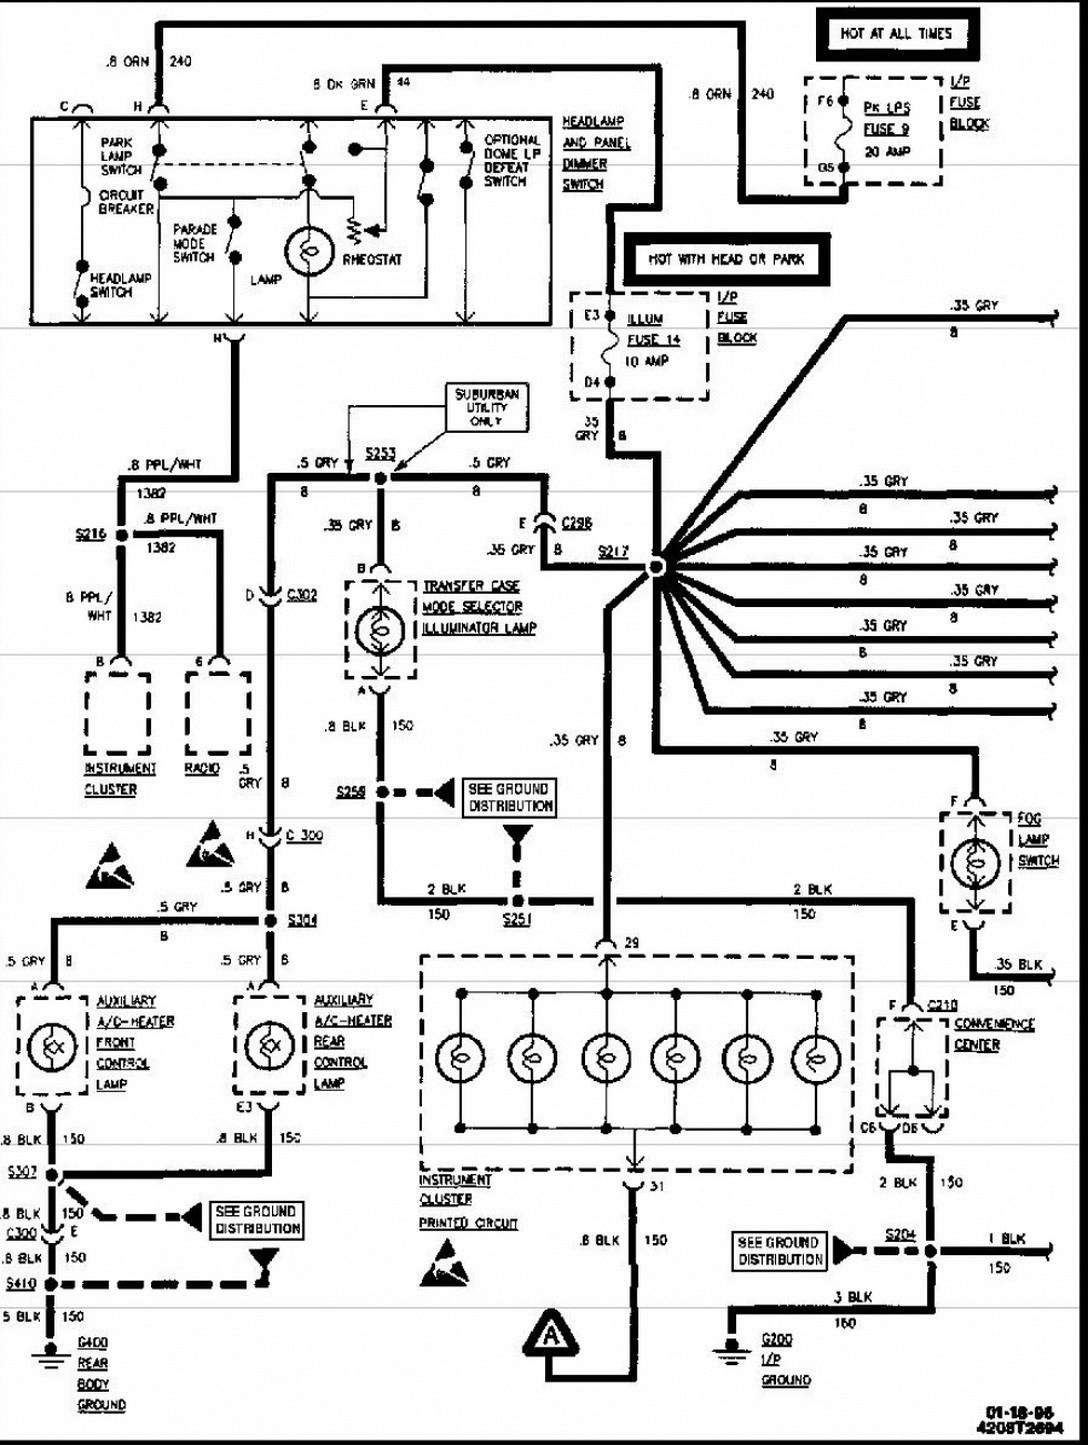 hight resolution of 93 corvette radio wiring diagram 1968 corvette am fm radio wiring 93 corvette engine diagram 1997